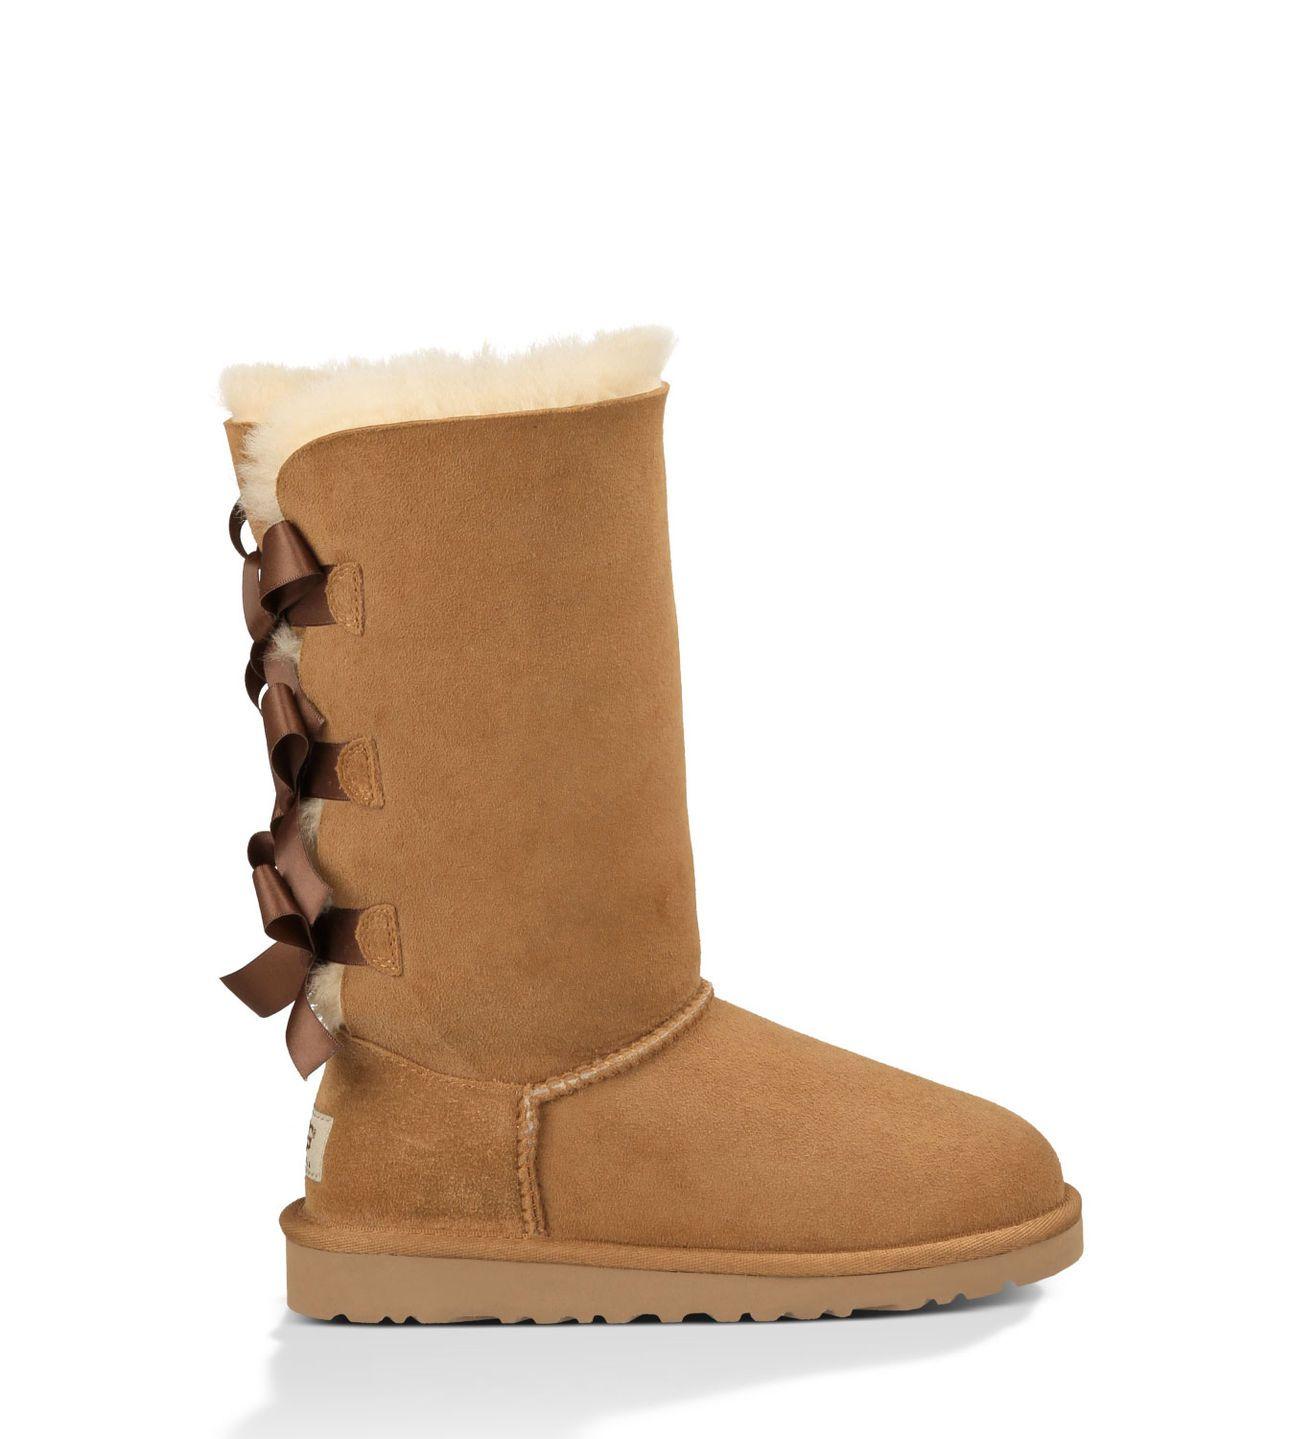 Bailey Bow Tall - Ugg (US) | Ugg boots